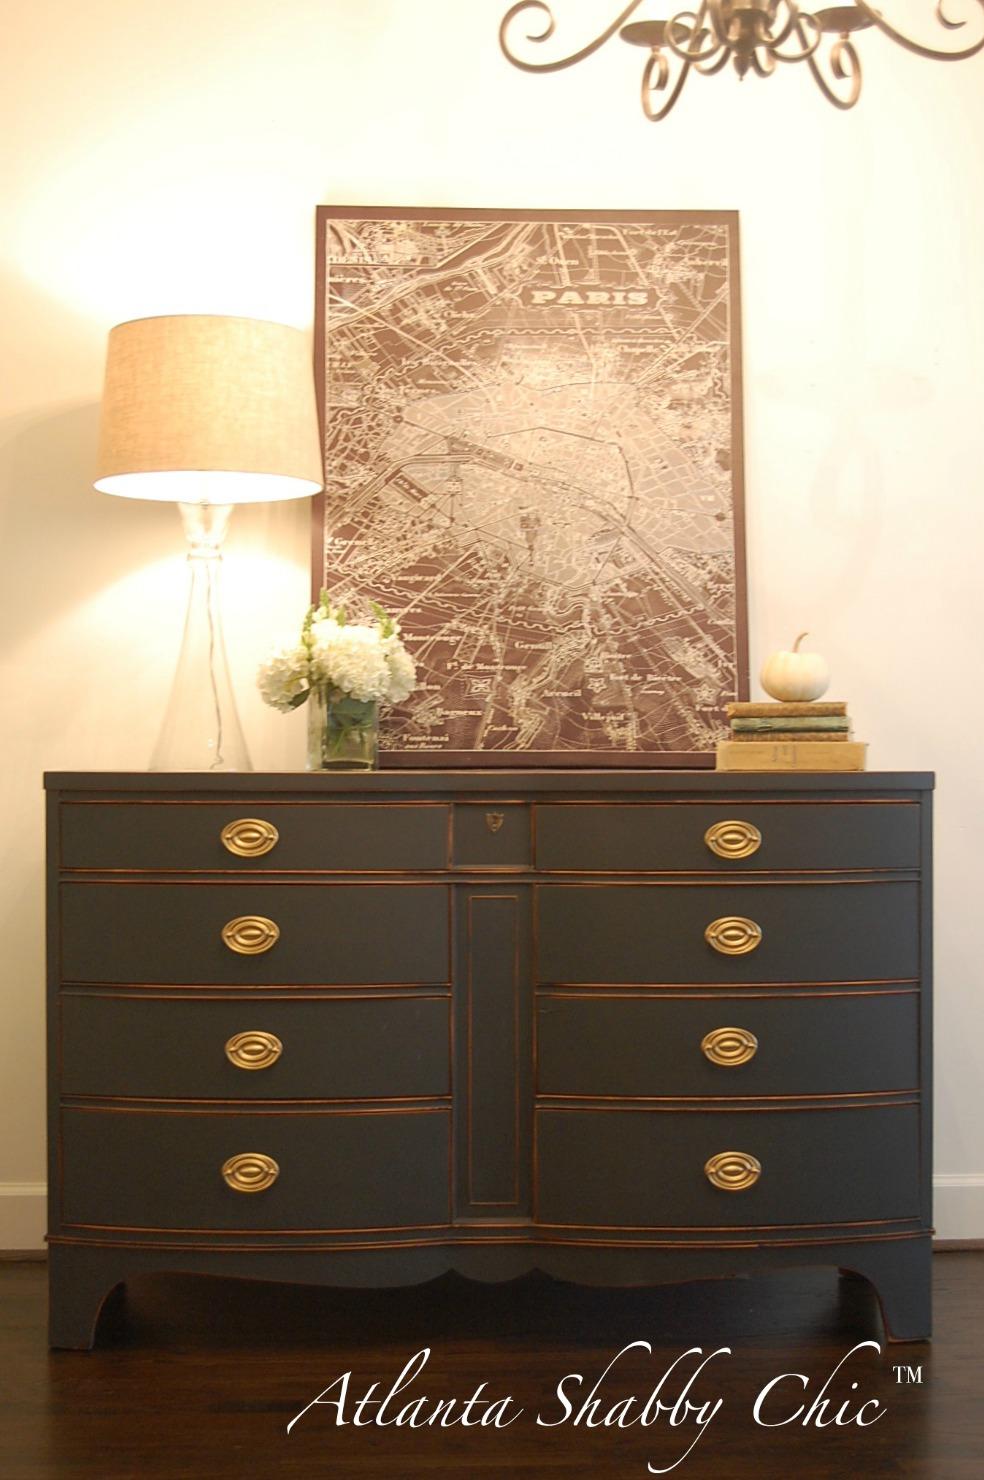 atlanta shabby chic antique bowfront dresser buffet sold. Black Bedroom Furniture Sets. Home Design Ideas